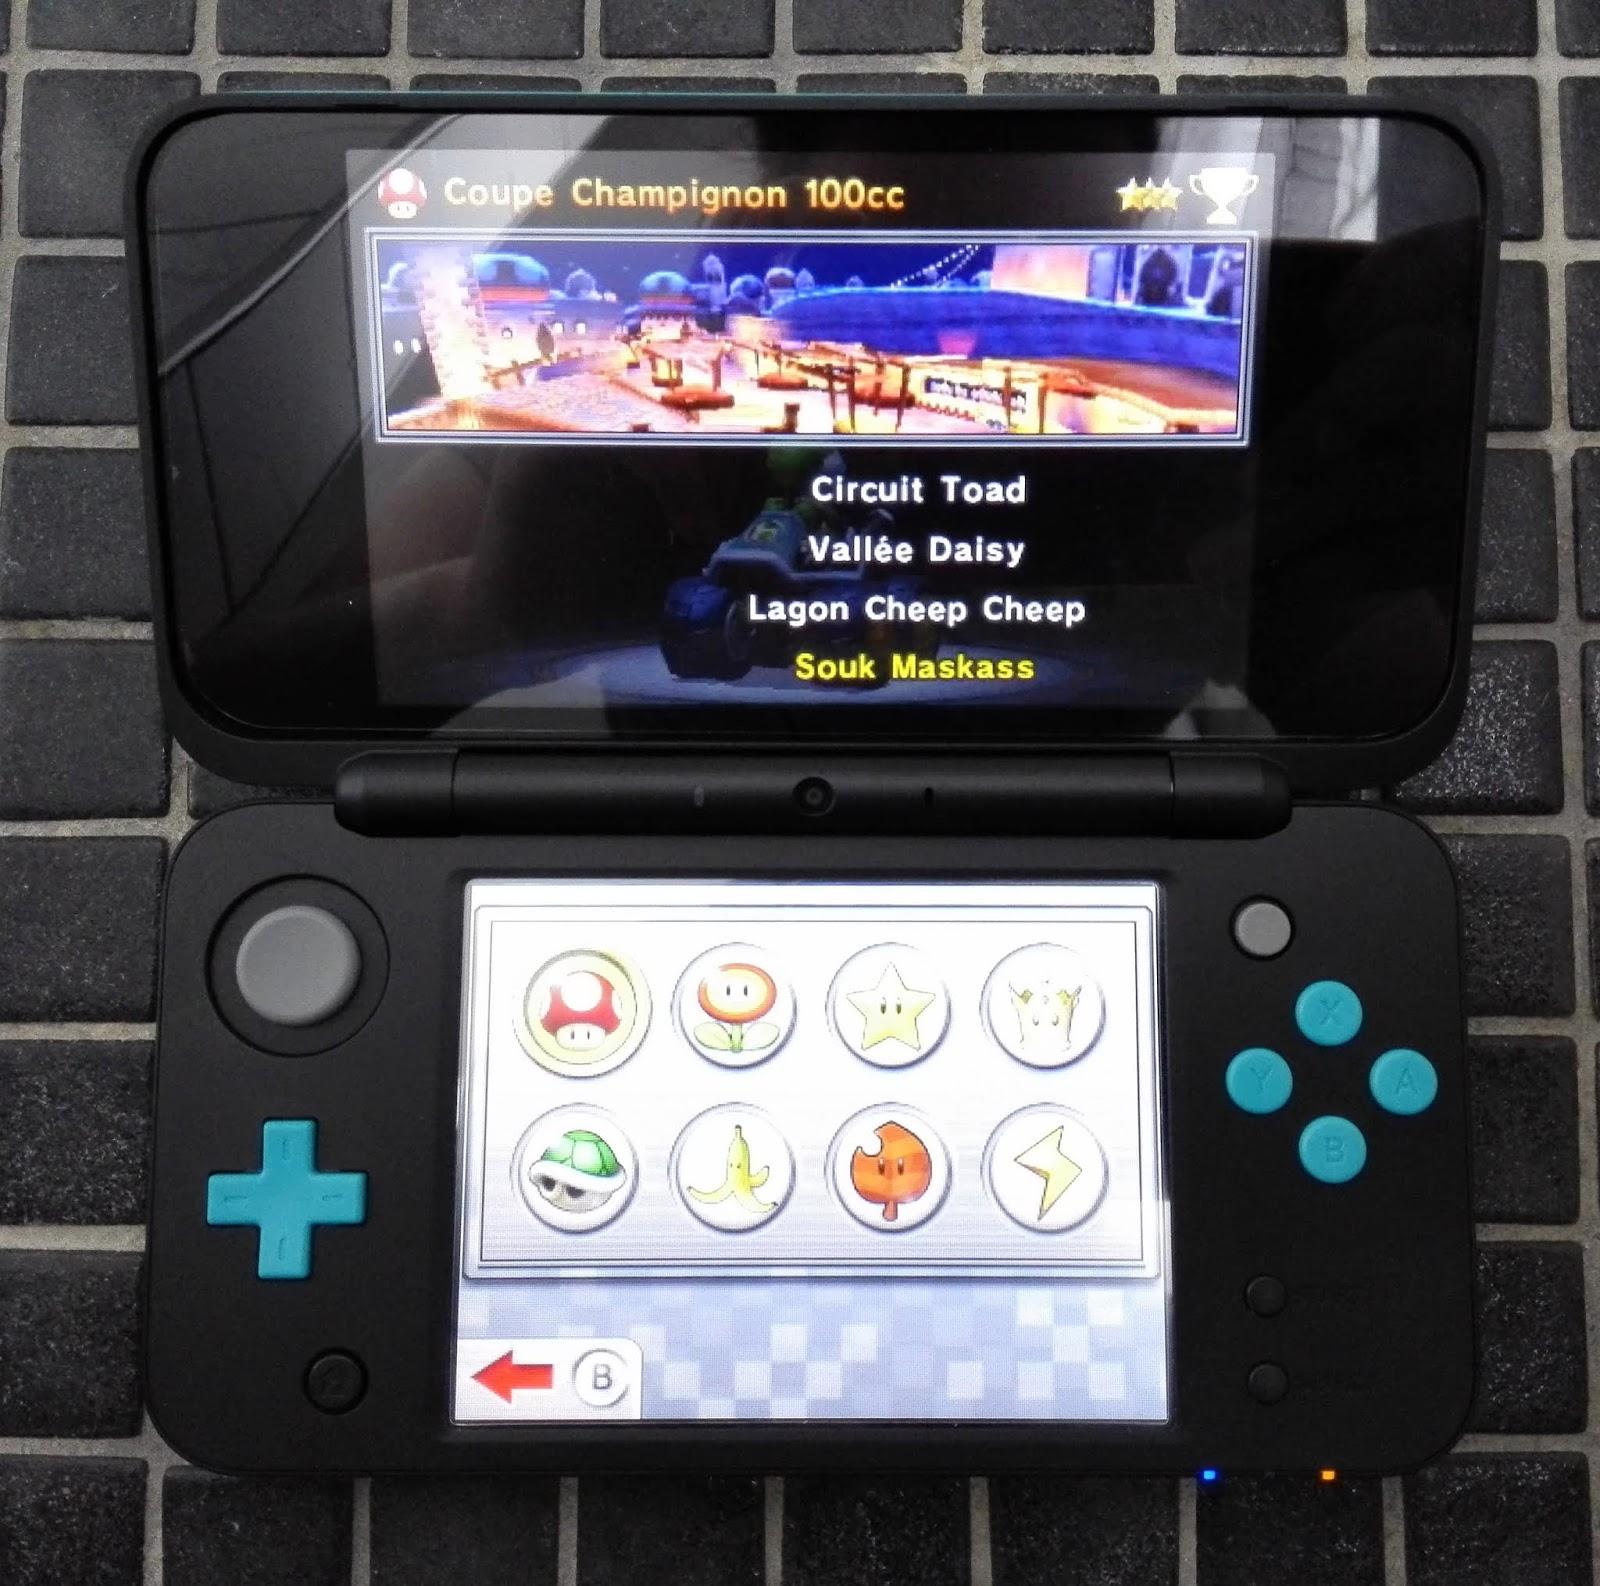 Karma Shachou Le Blog Geek Jeux Video Mario Kart 7 3ds